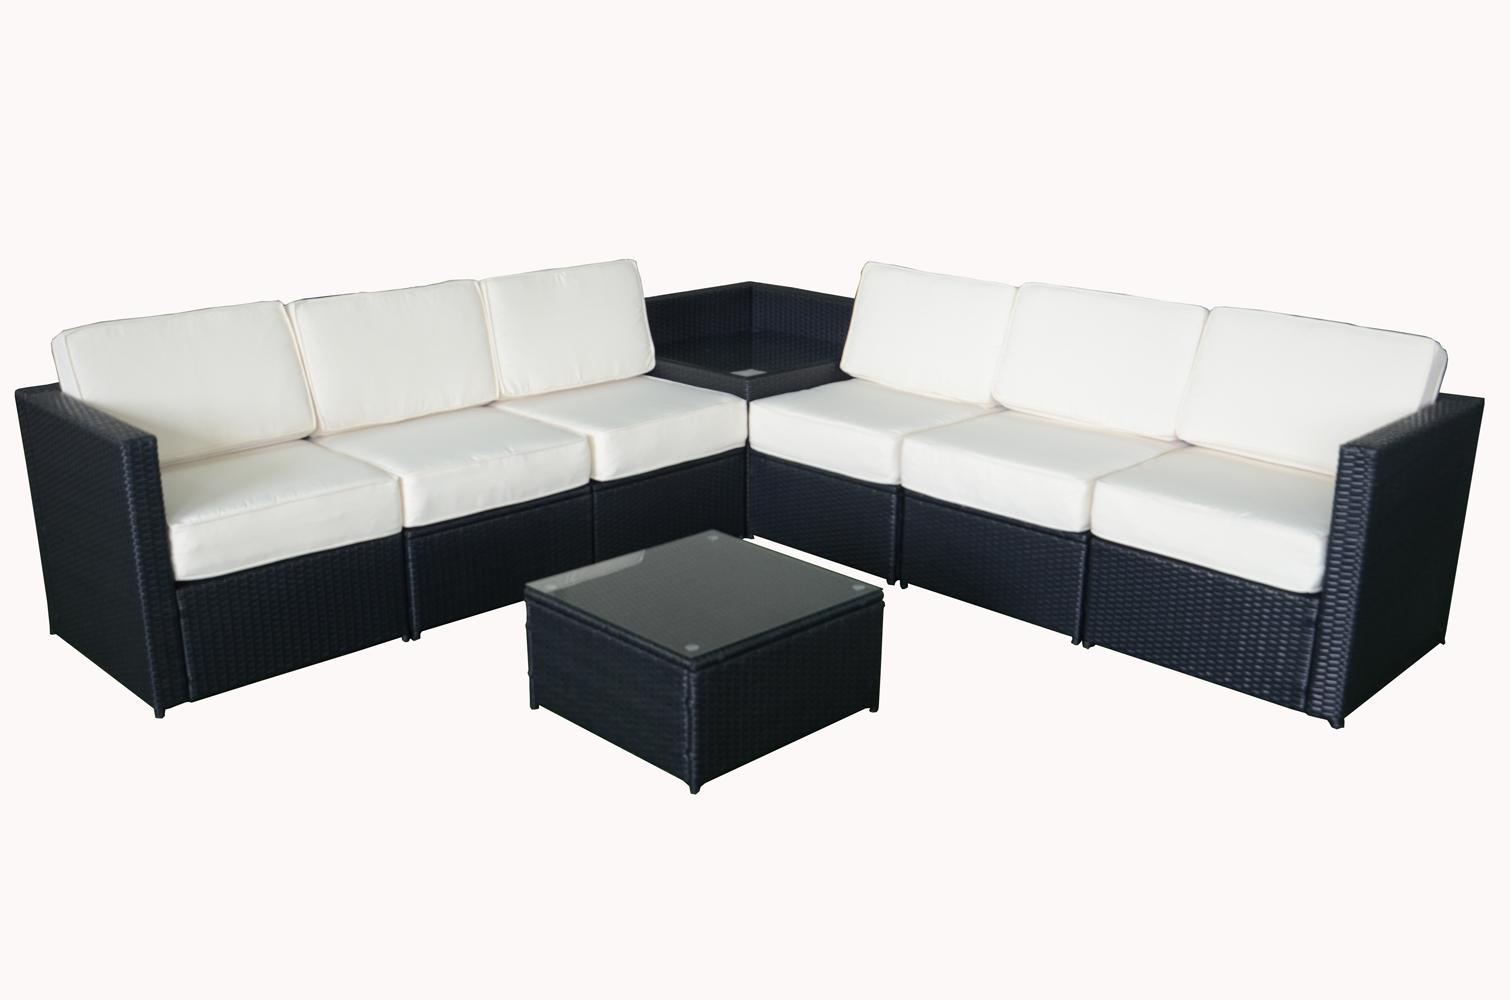 Mcombo 8pcs Black Wicker Patio Sectional Outdoor Sofa Furniture Set 6088 1008 Ebay